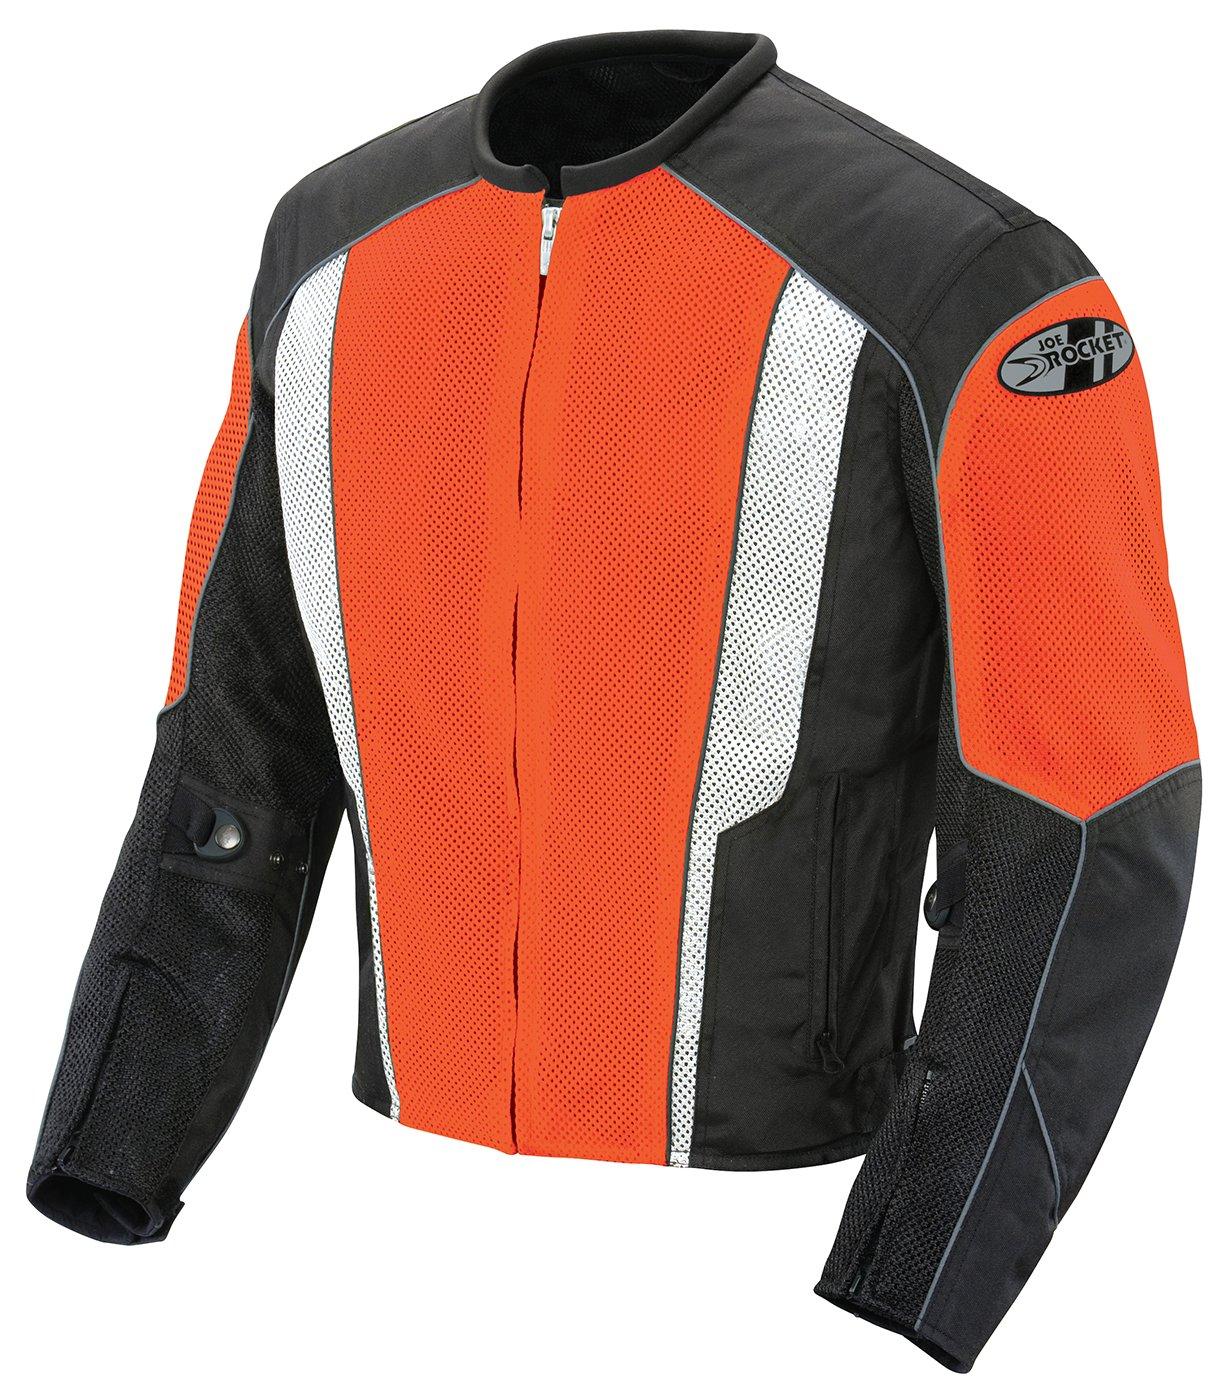 Joe Rocket Phoenix 5.0 Men's Mesh Motorcycle Riding Jacket (Orange/Black, X-Large) by Joe Rocket